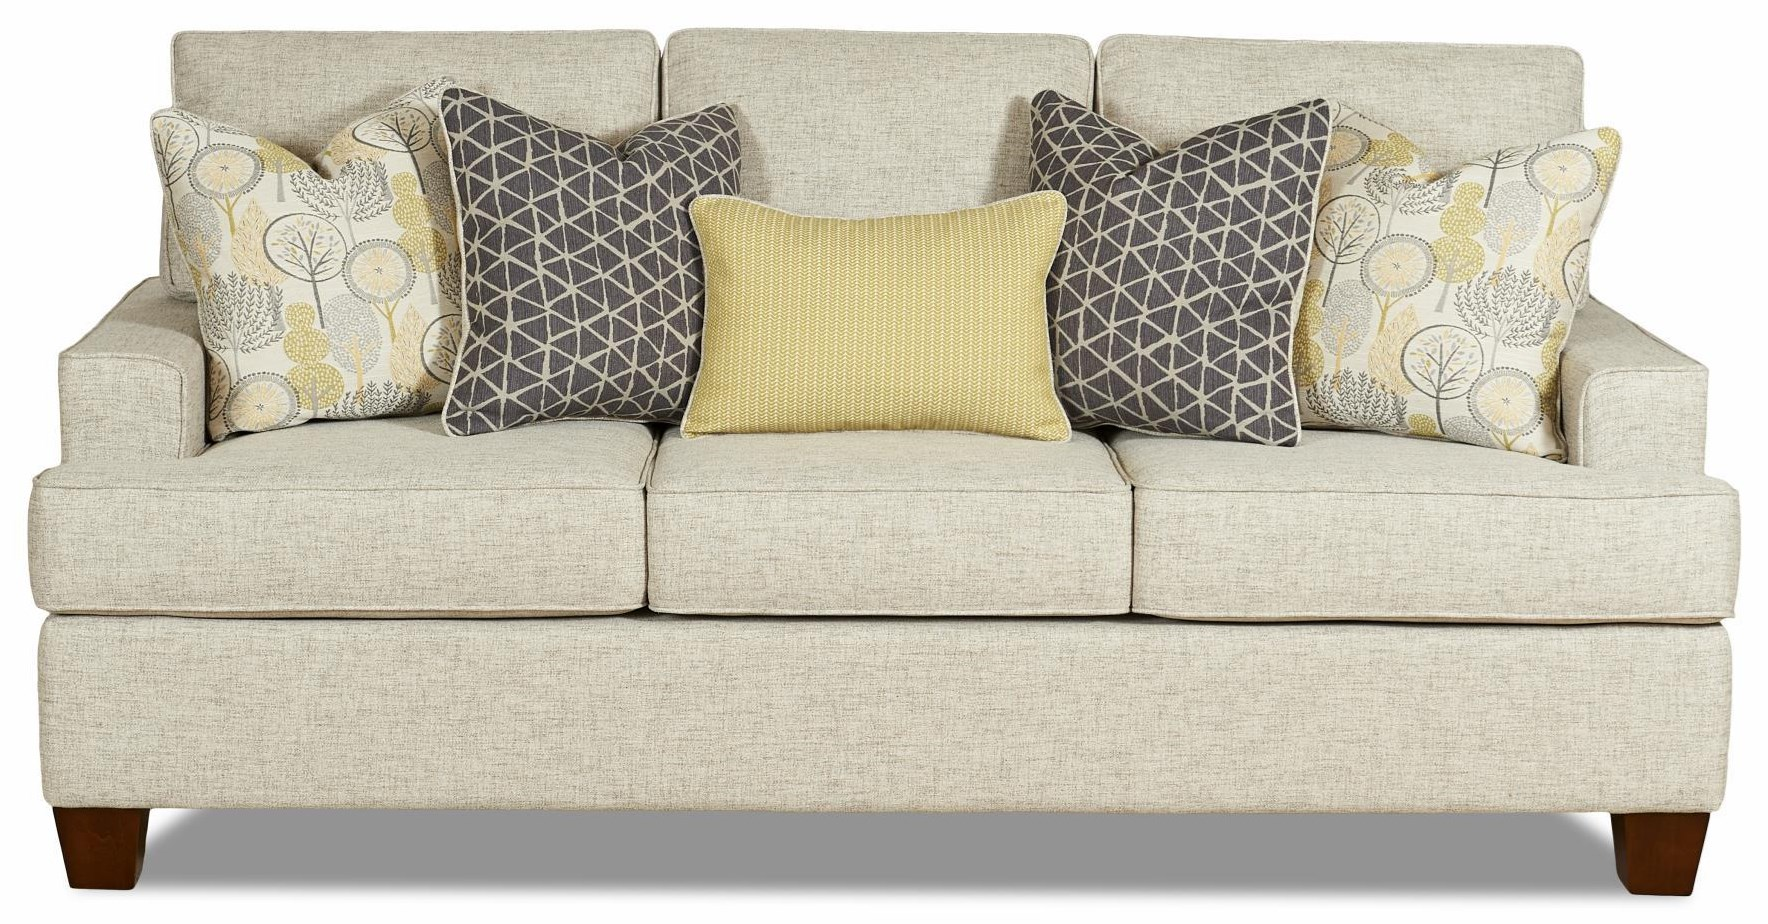 Bayside Sofa by Wood House at Crowley Furniture & Mattress